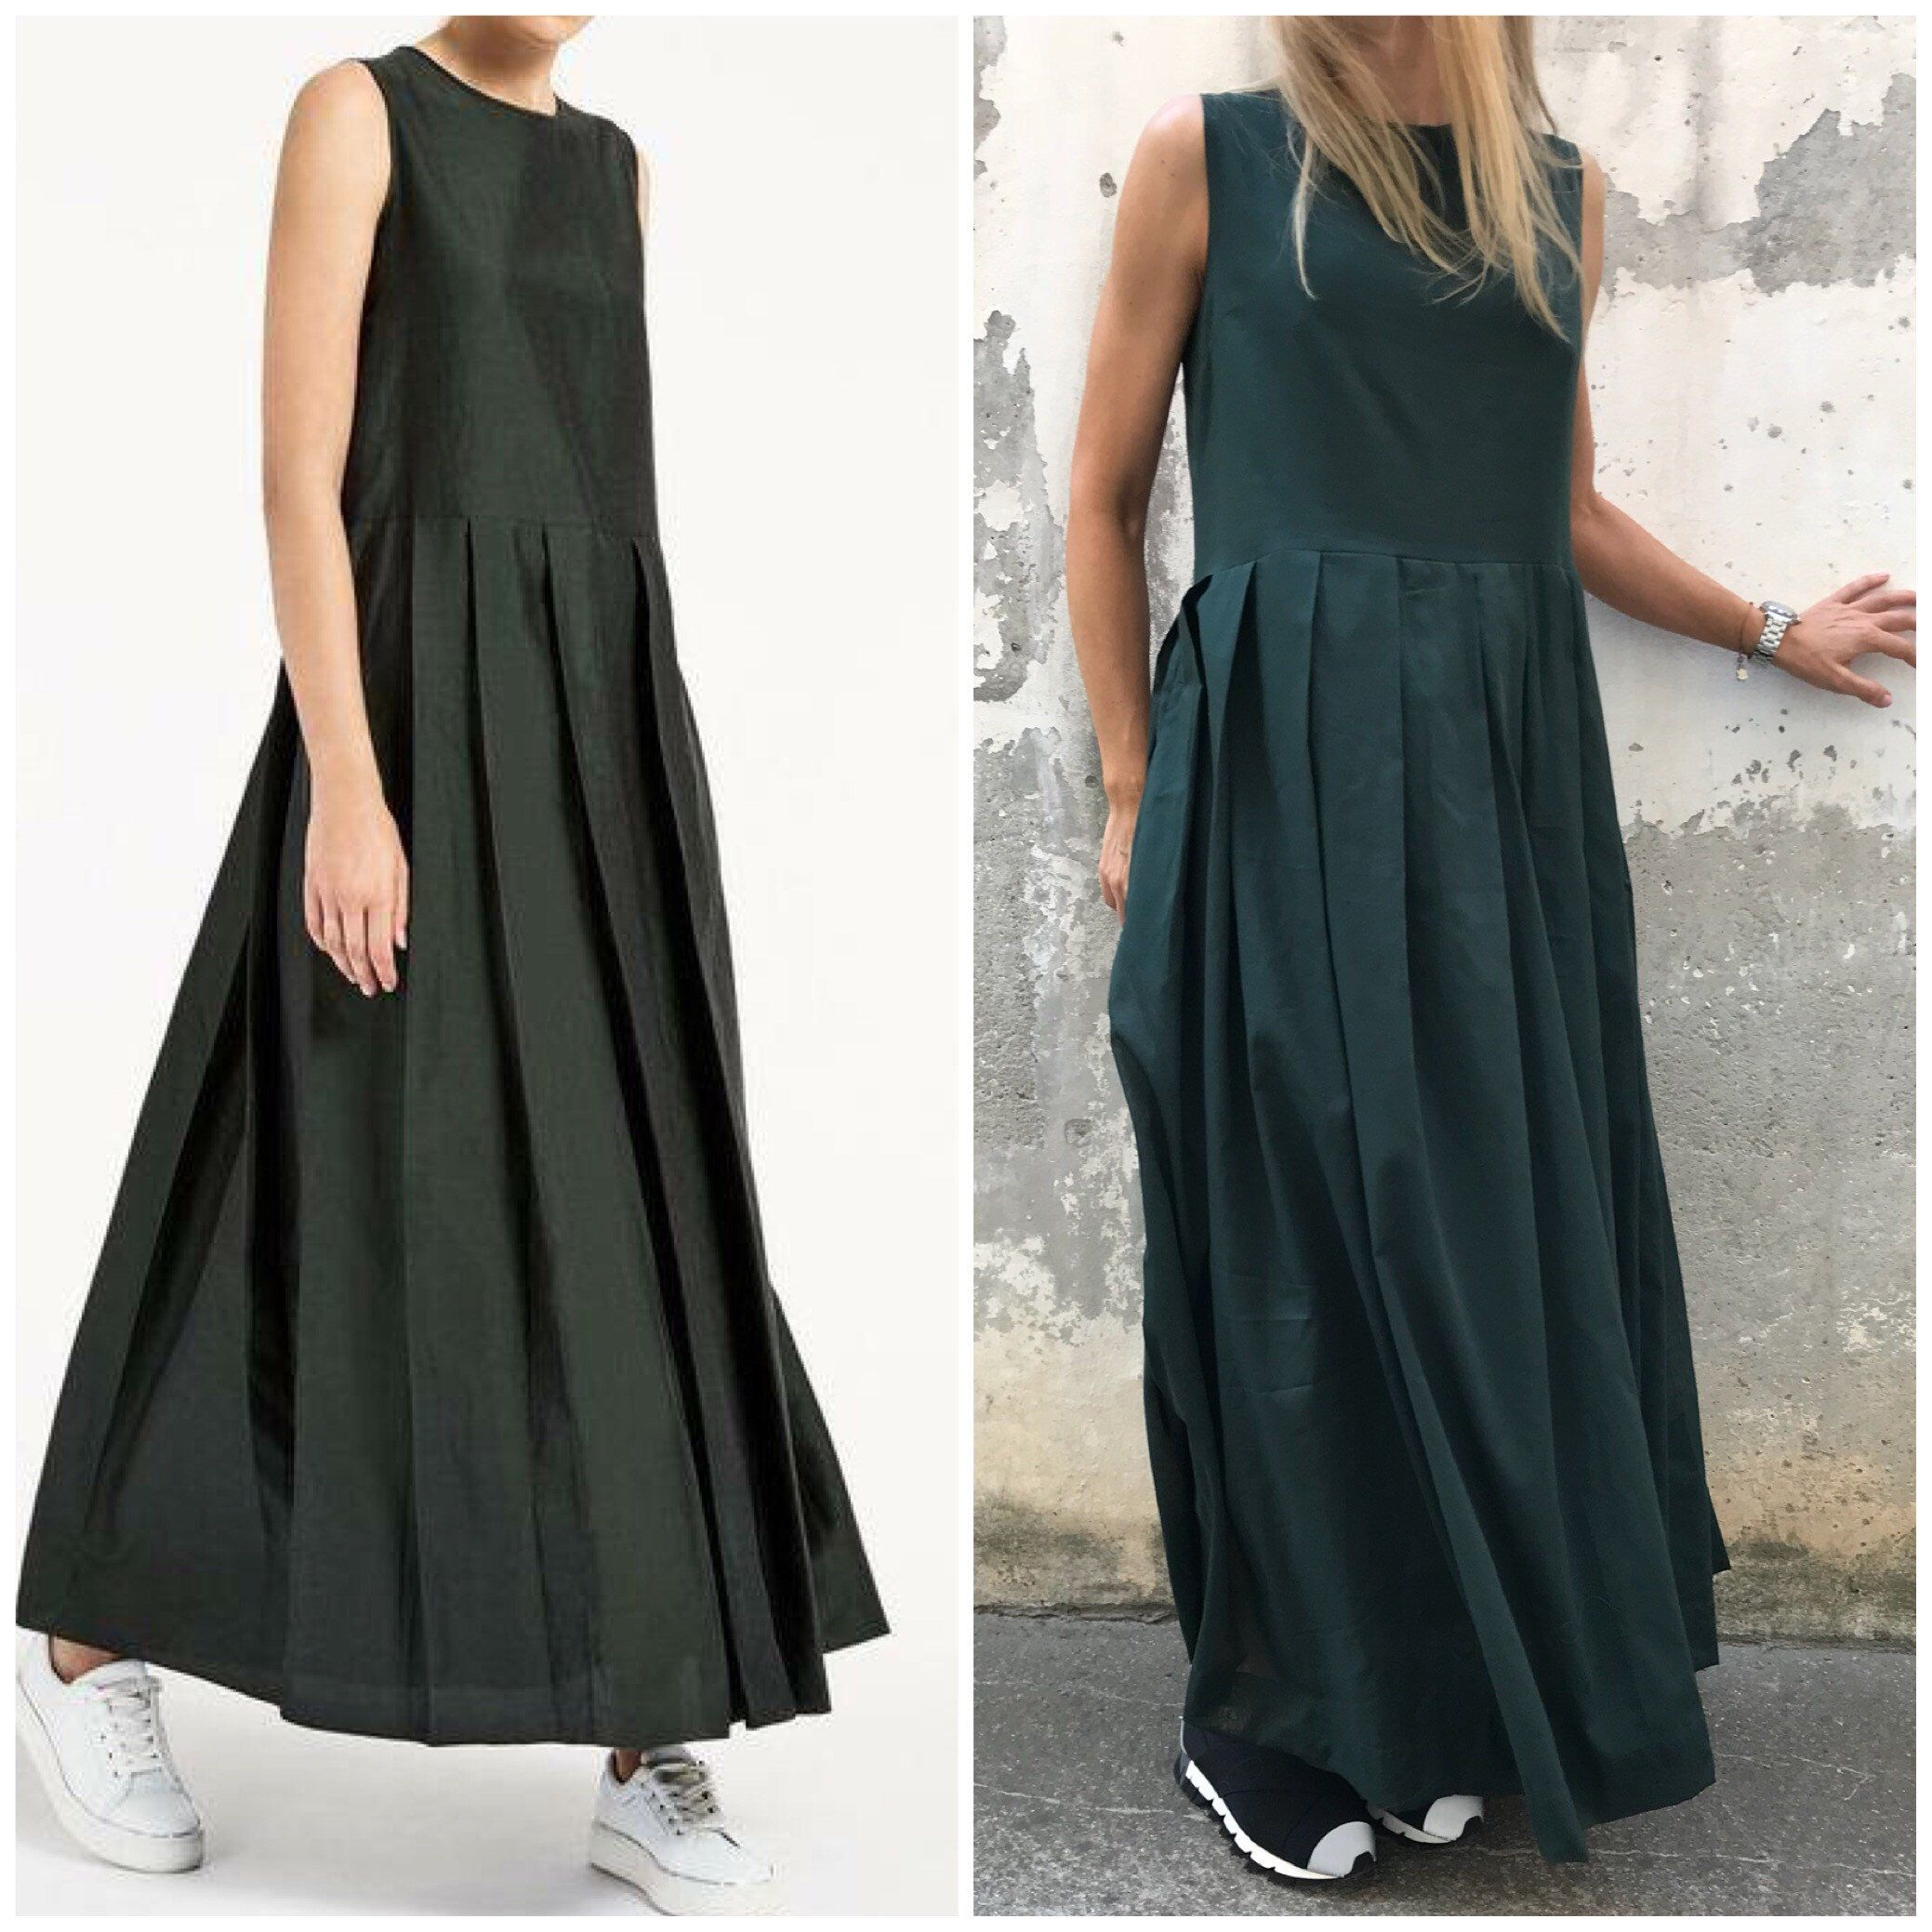 Pleated dress paradox long dress bridesmaid dress sleeveless